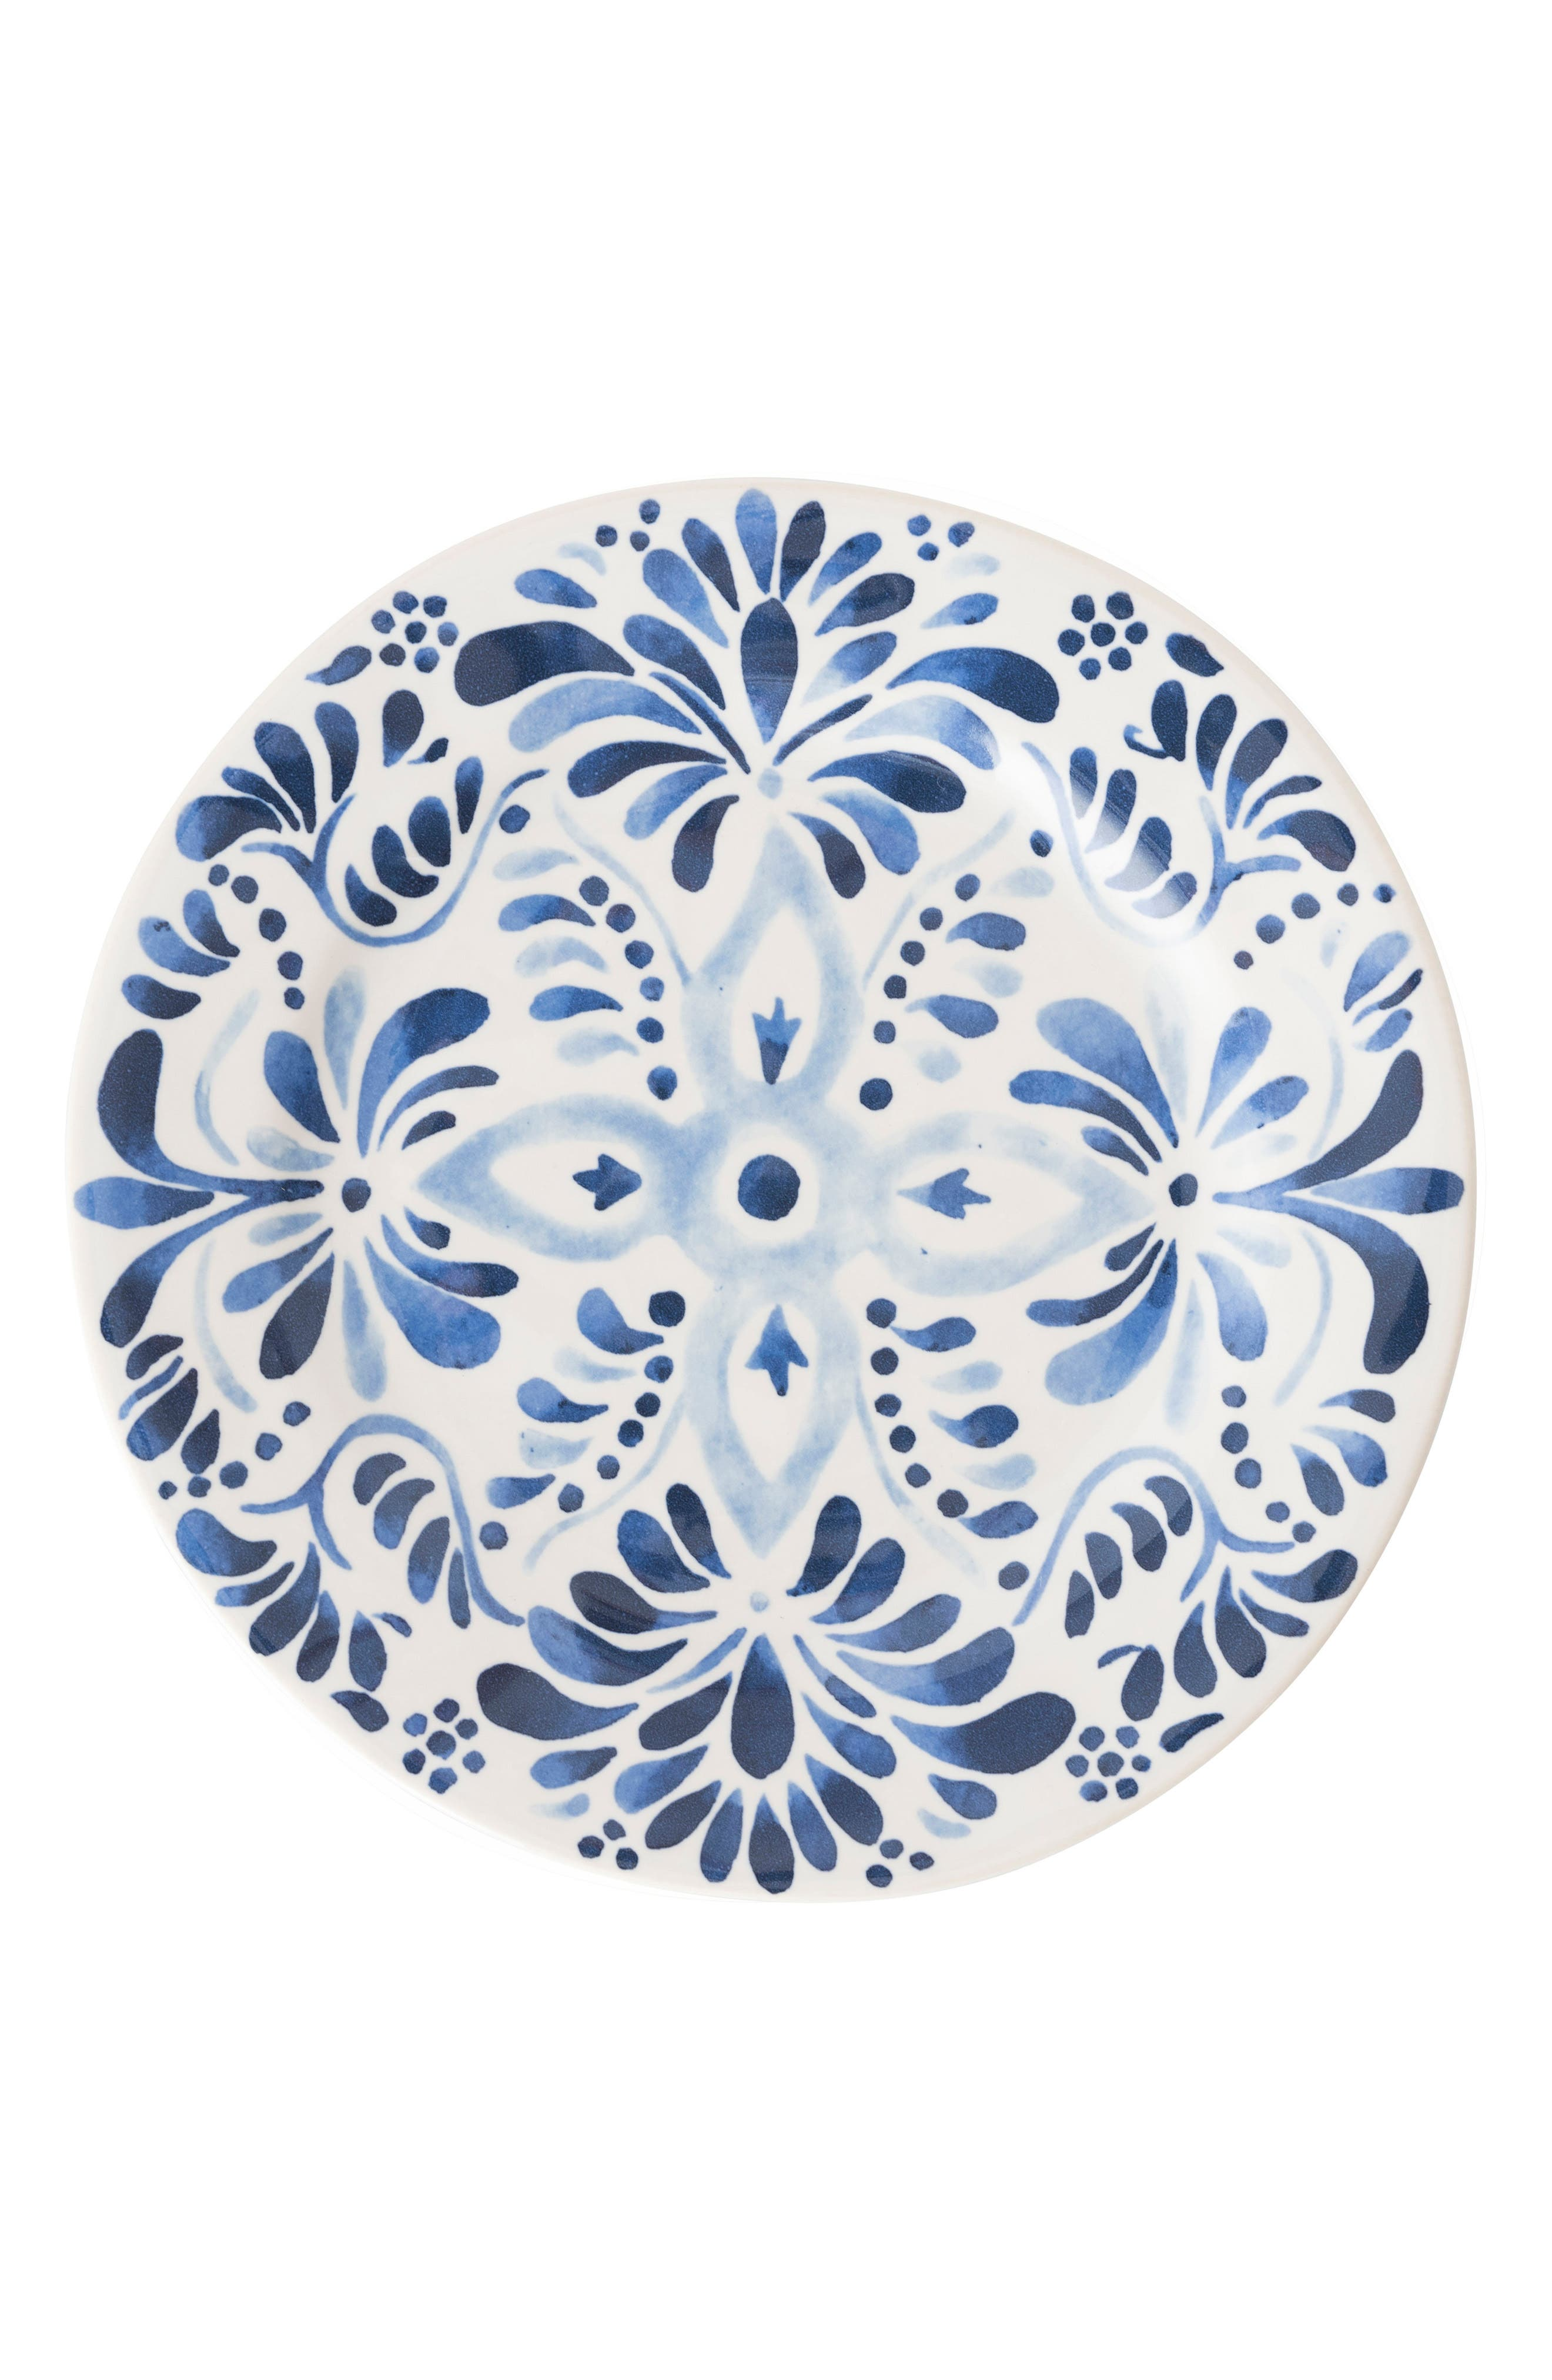 Wanderlust Collection - Sitio Stripe Stoneware Dinner Plate,                             Main thumbnail 1, color,                             Indigo